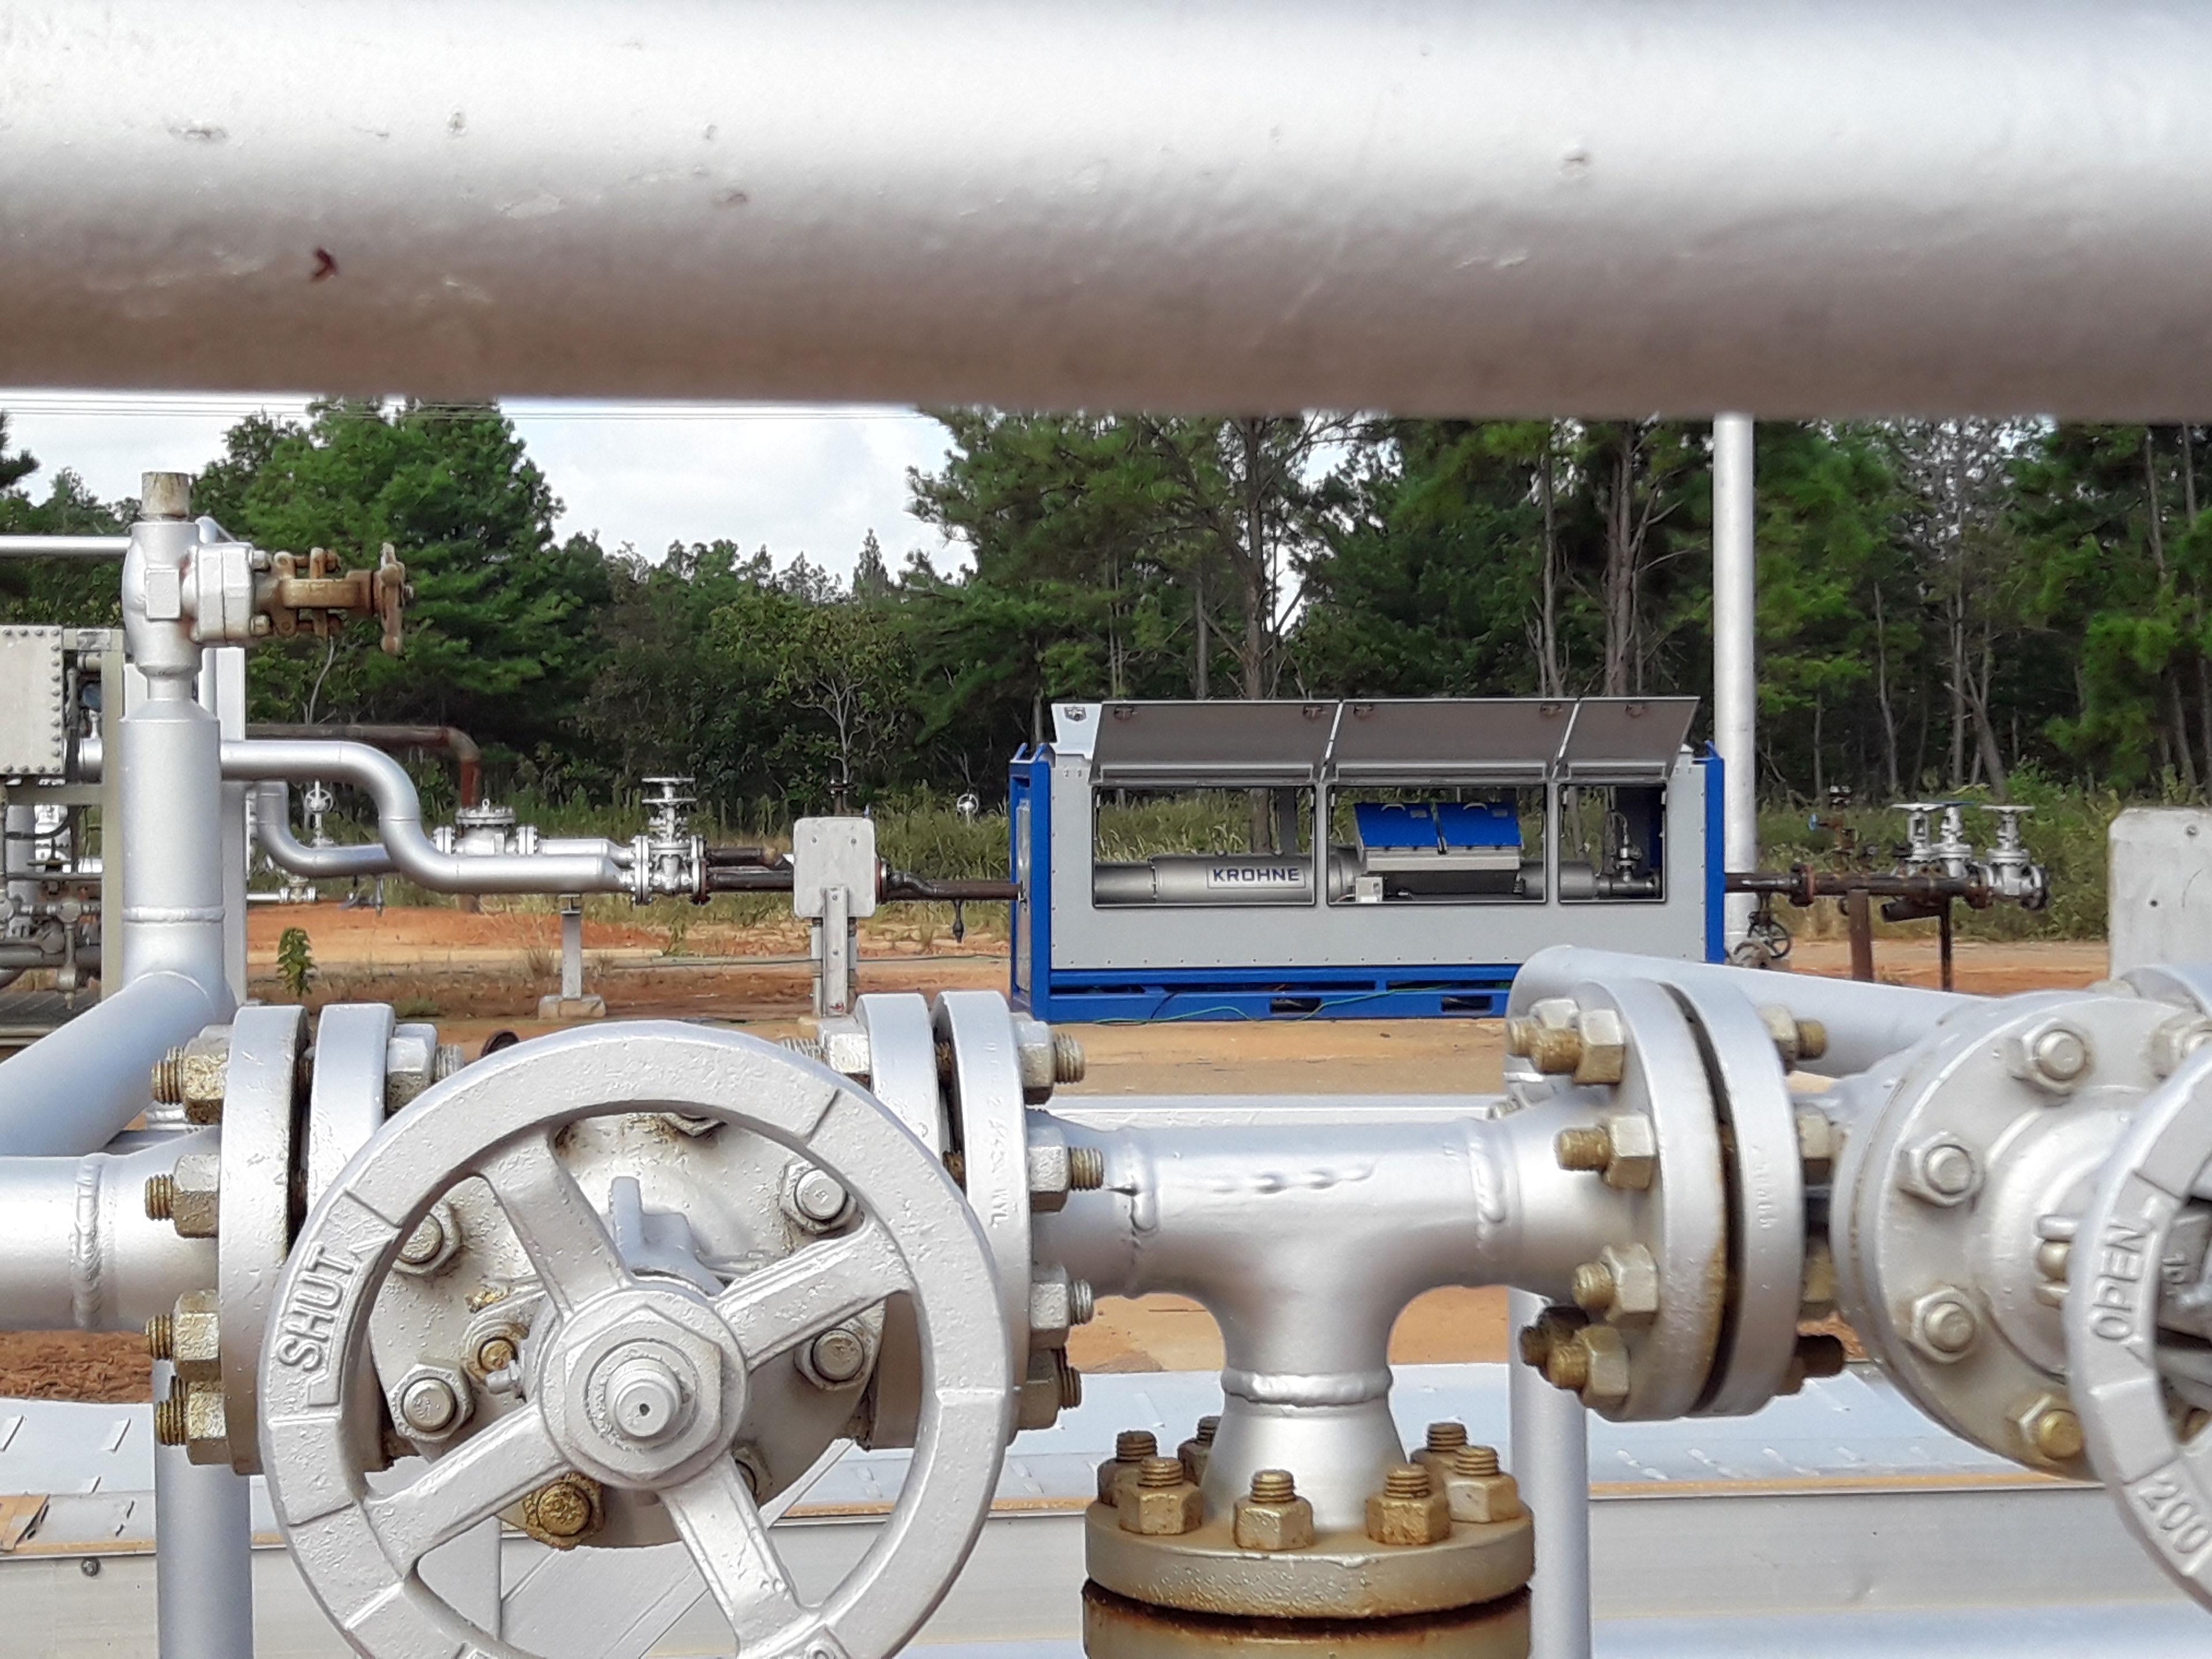 M-PHASE 5000 multiphase flowmeter behind pipelines